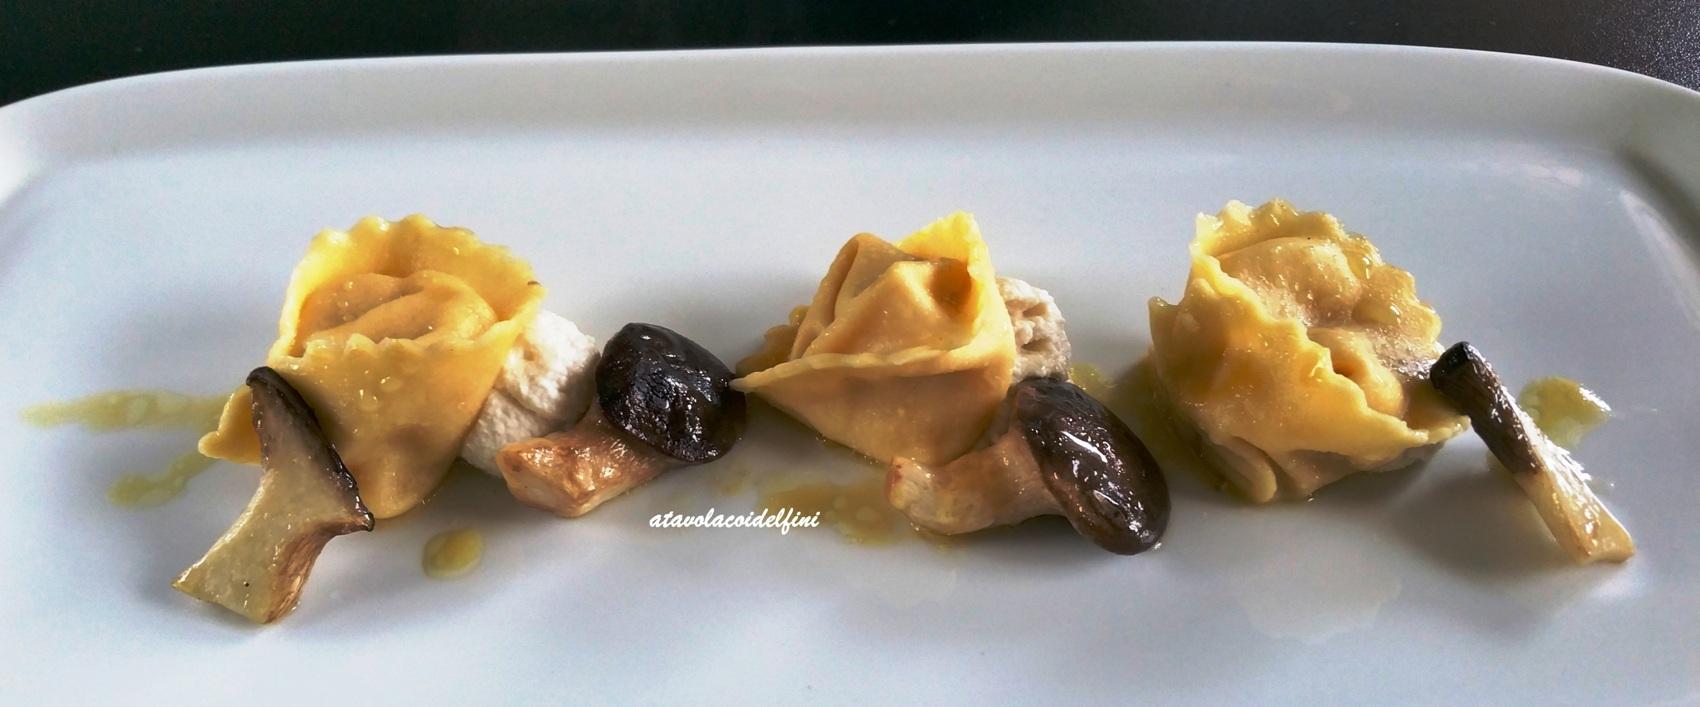 Tortelli di zucca e mandarino su crema di mandorle e funghi cardoncelli